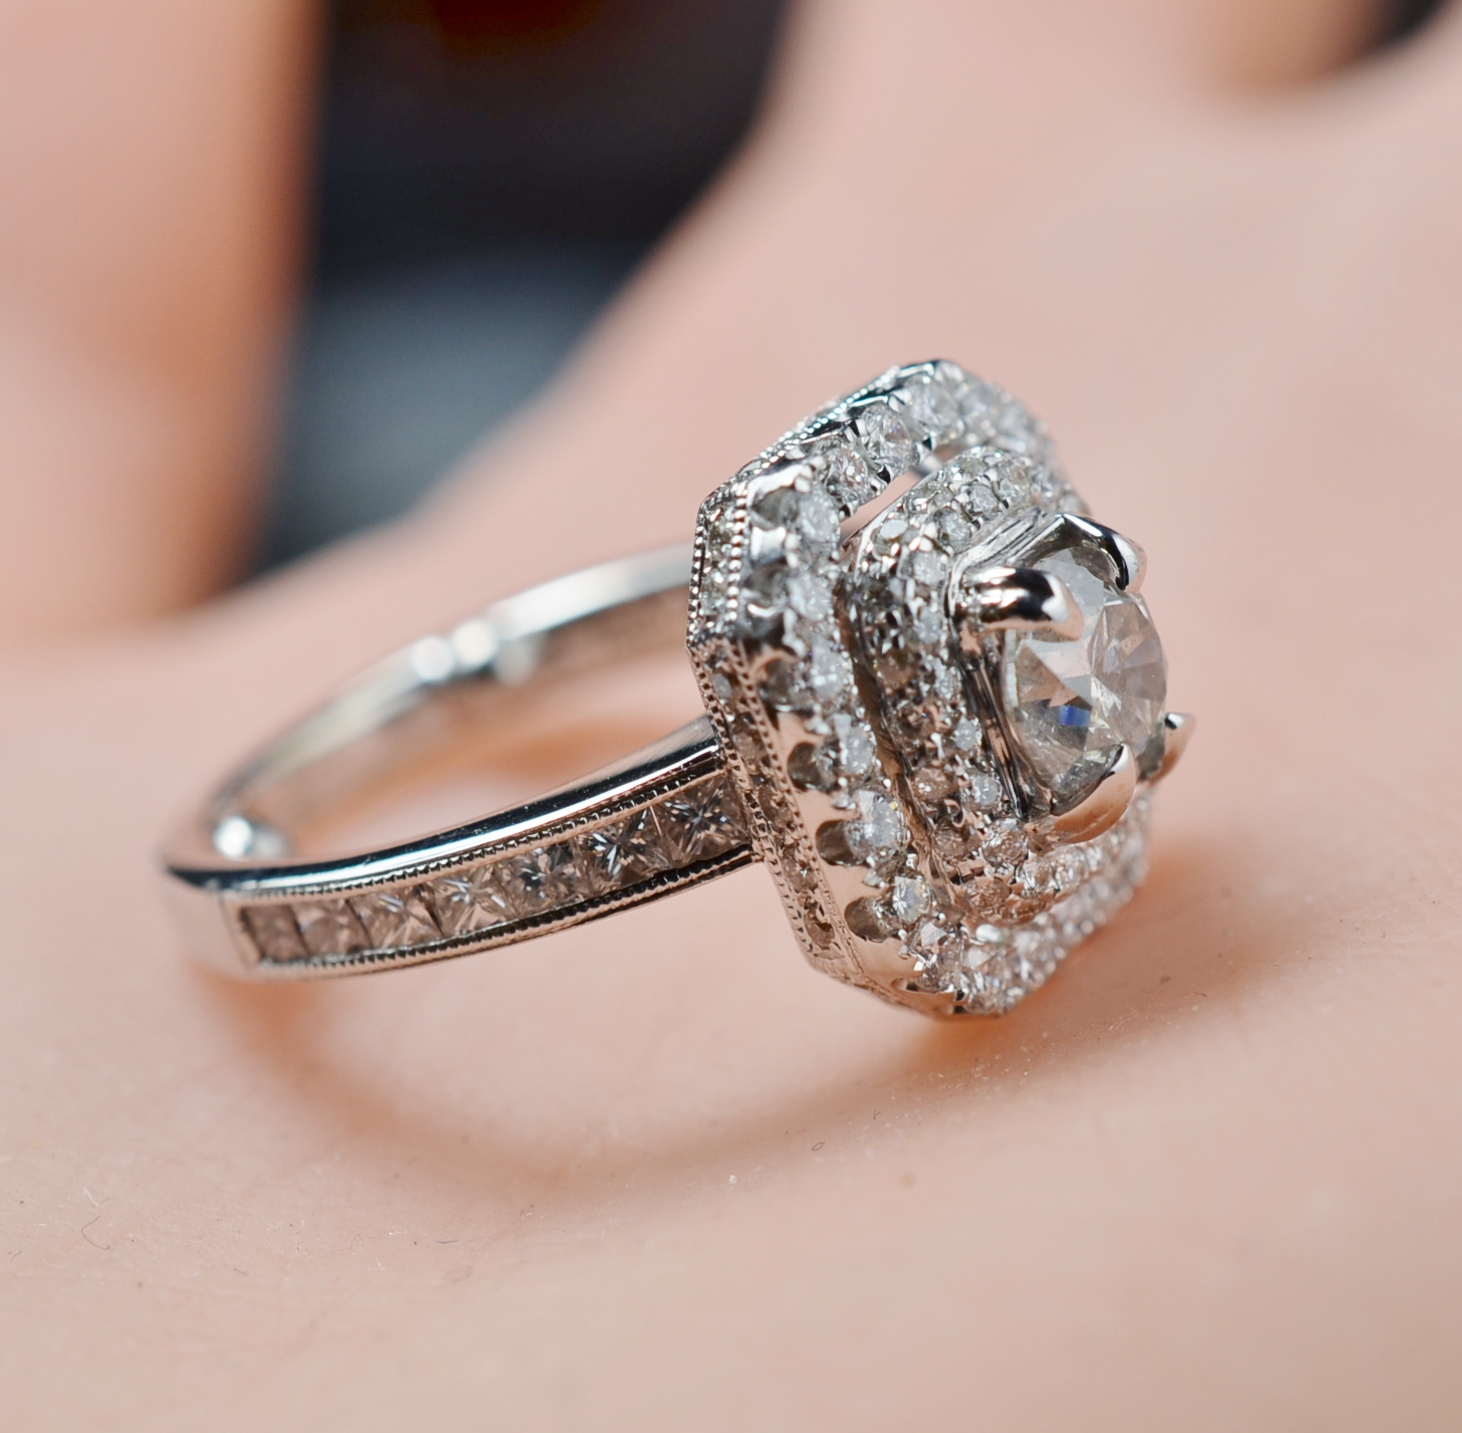 1 And A Half Carat Diamond Price